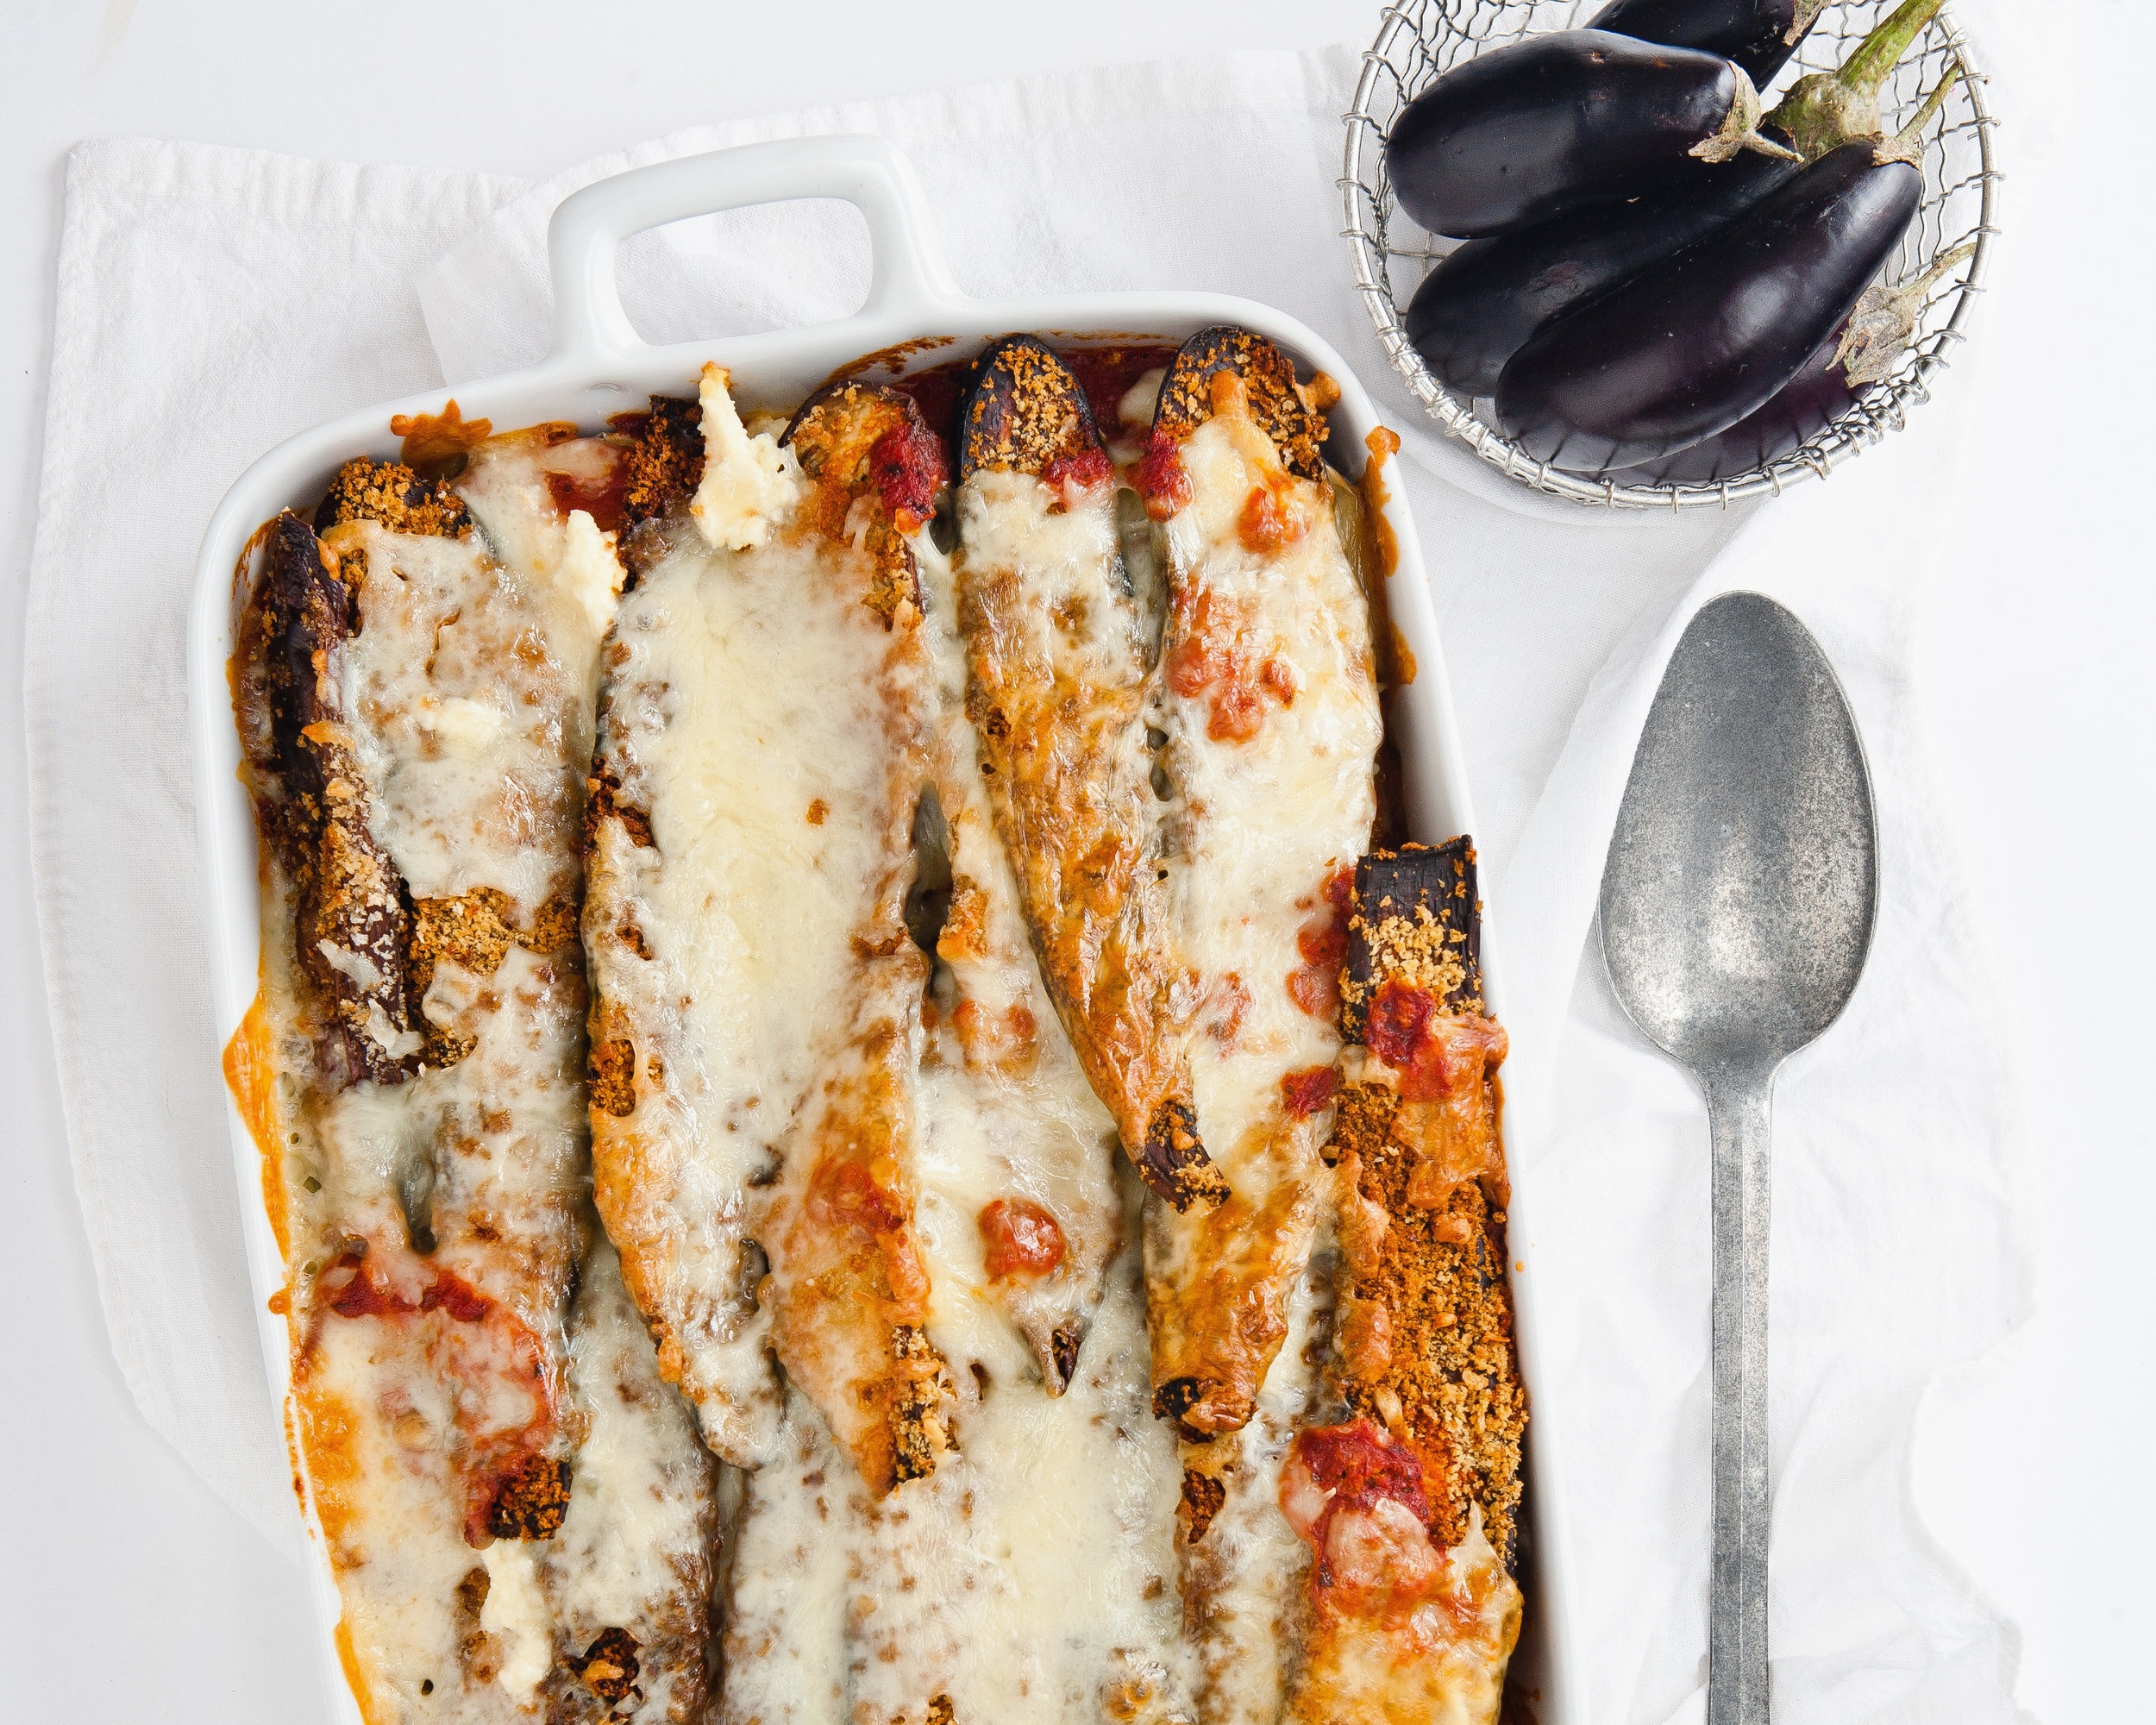 Baked eggplant with ricotta, Parmesan and mozzarella.jpg